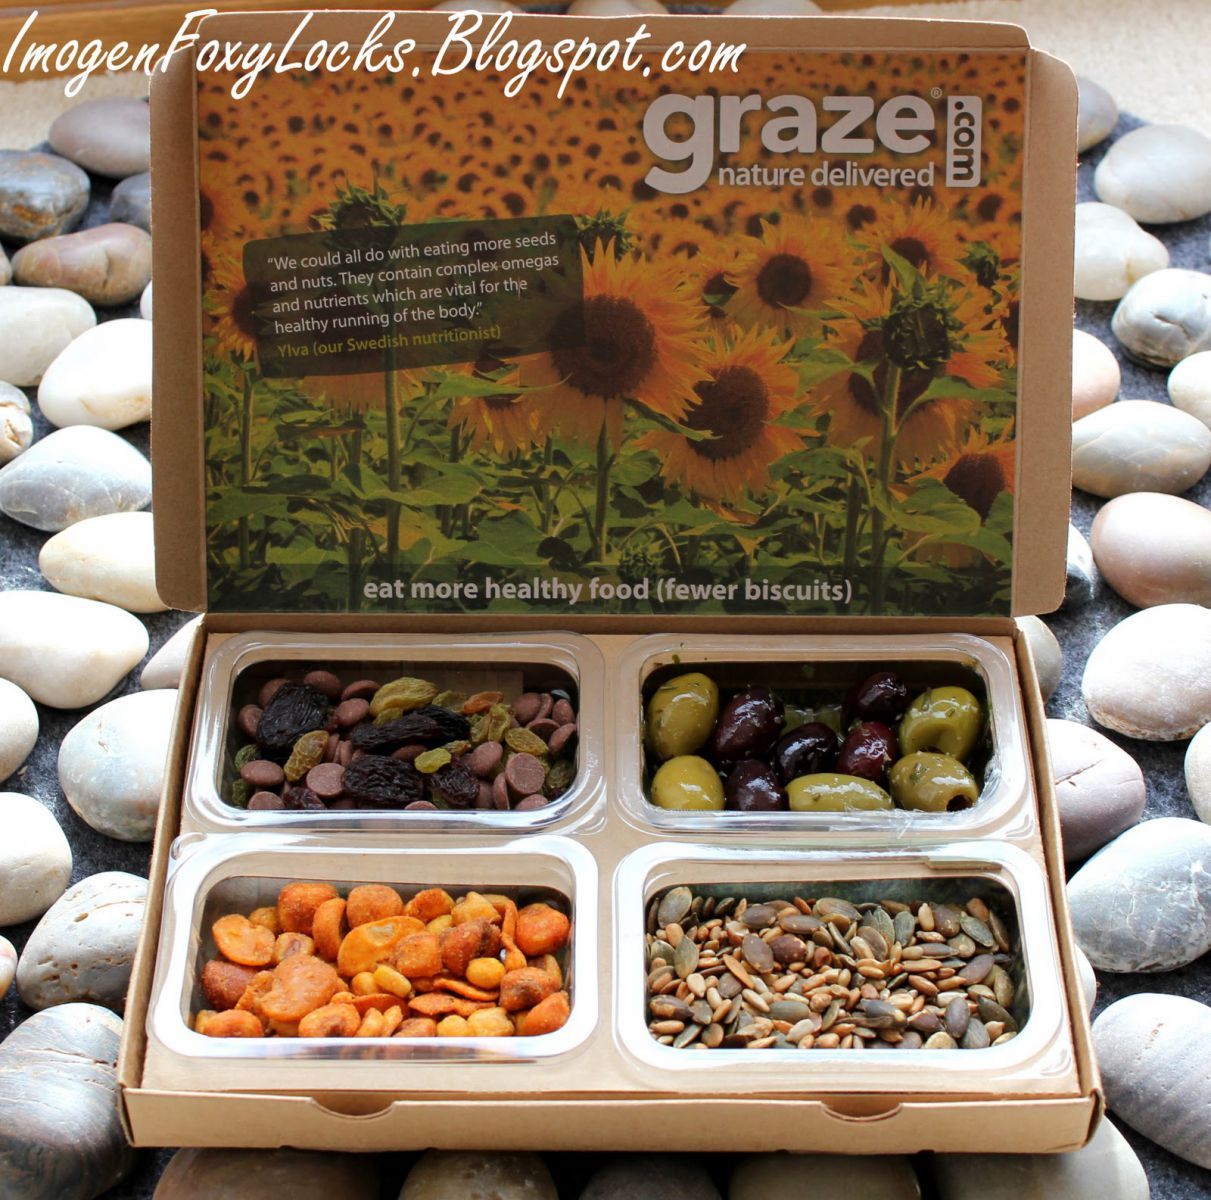 free graze boxes discounts